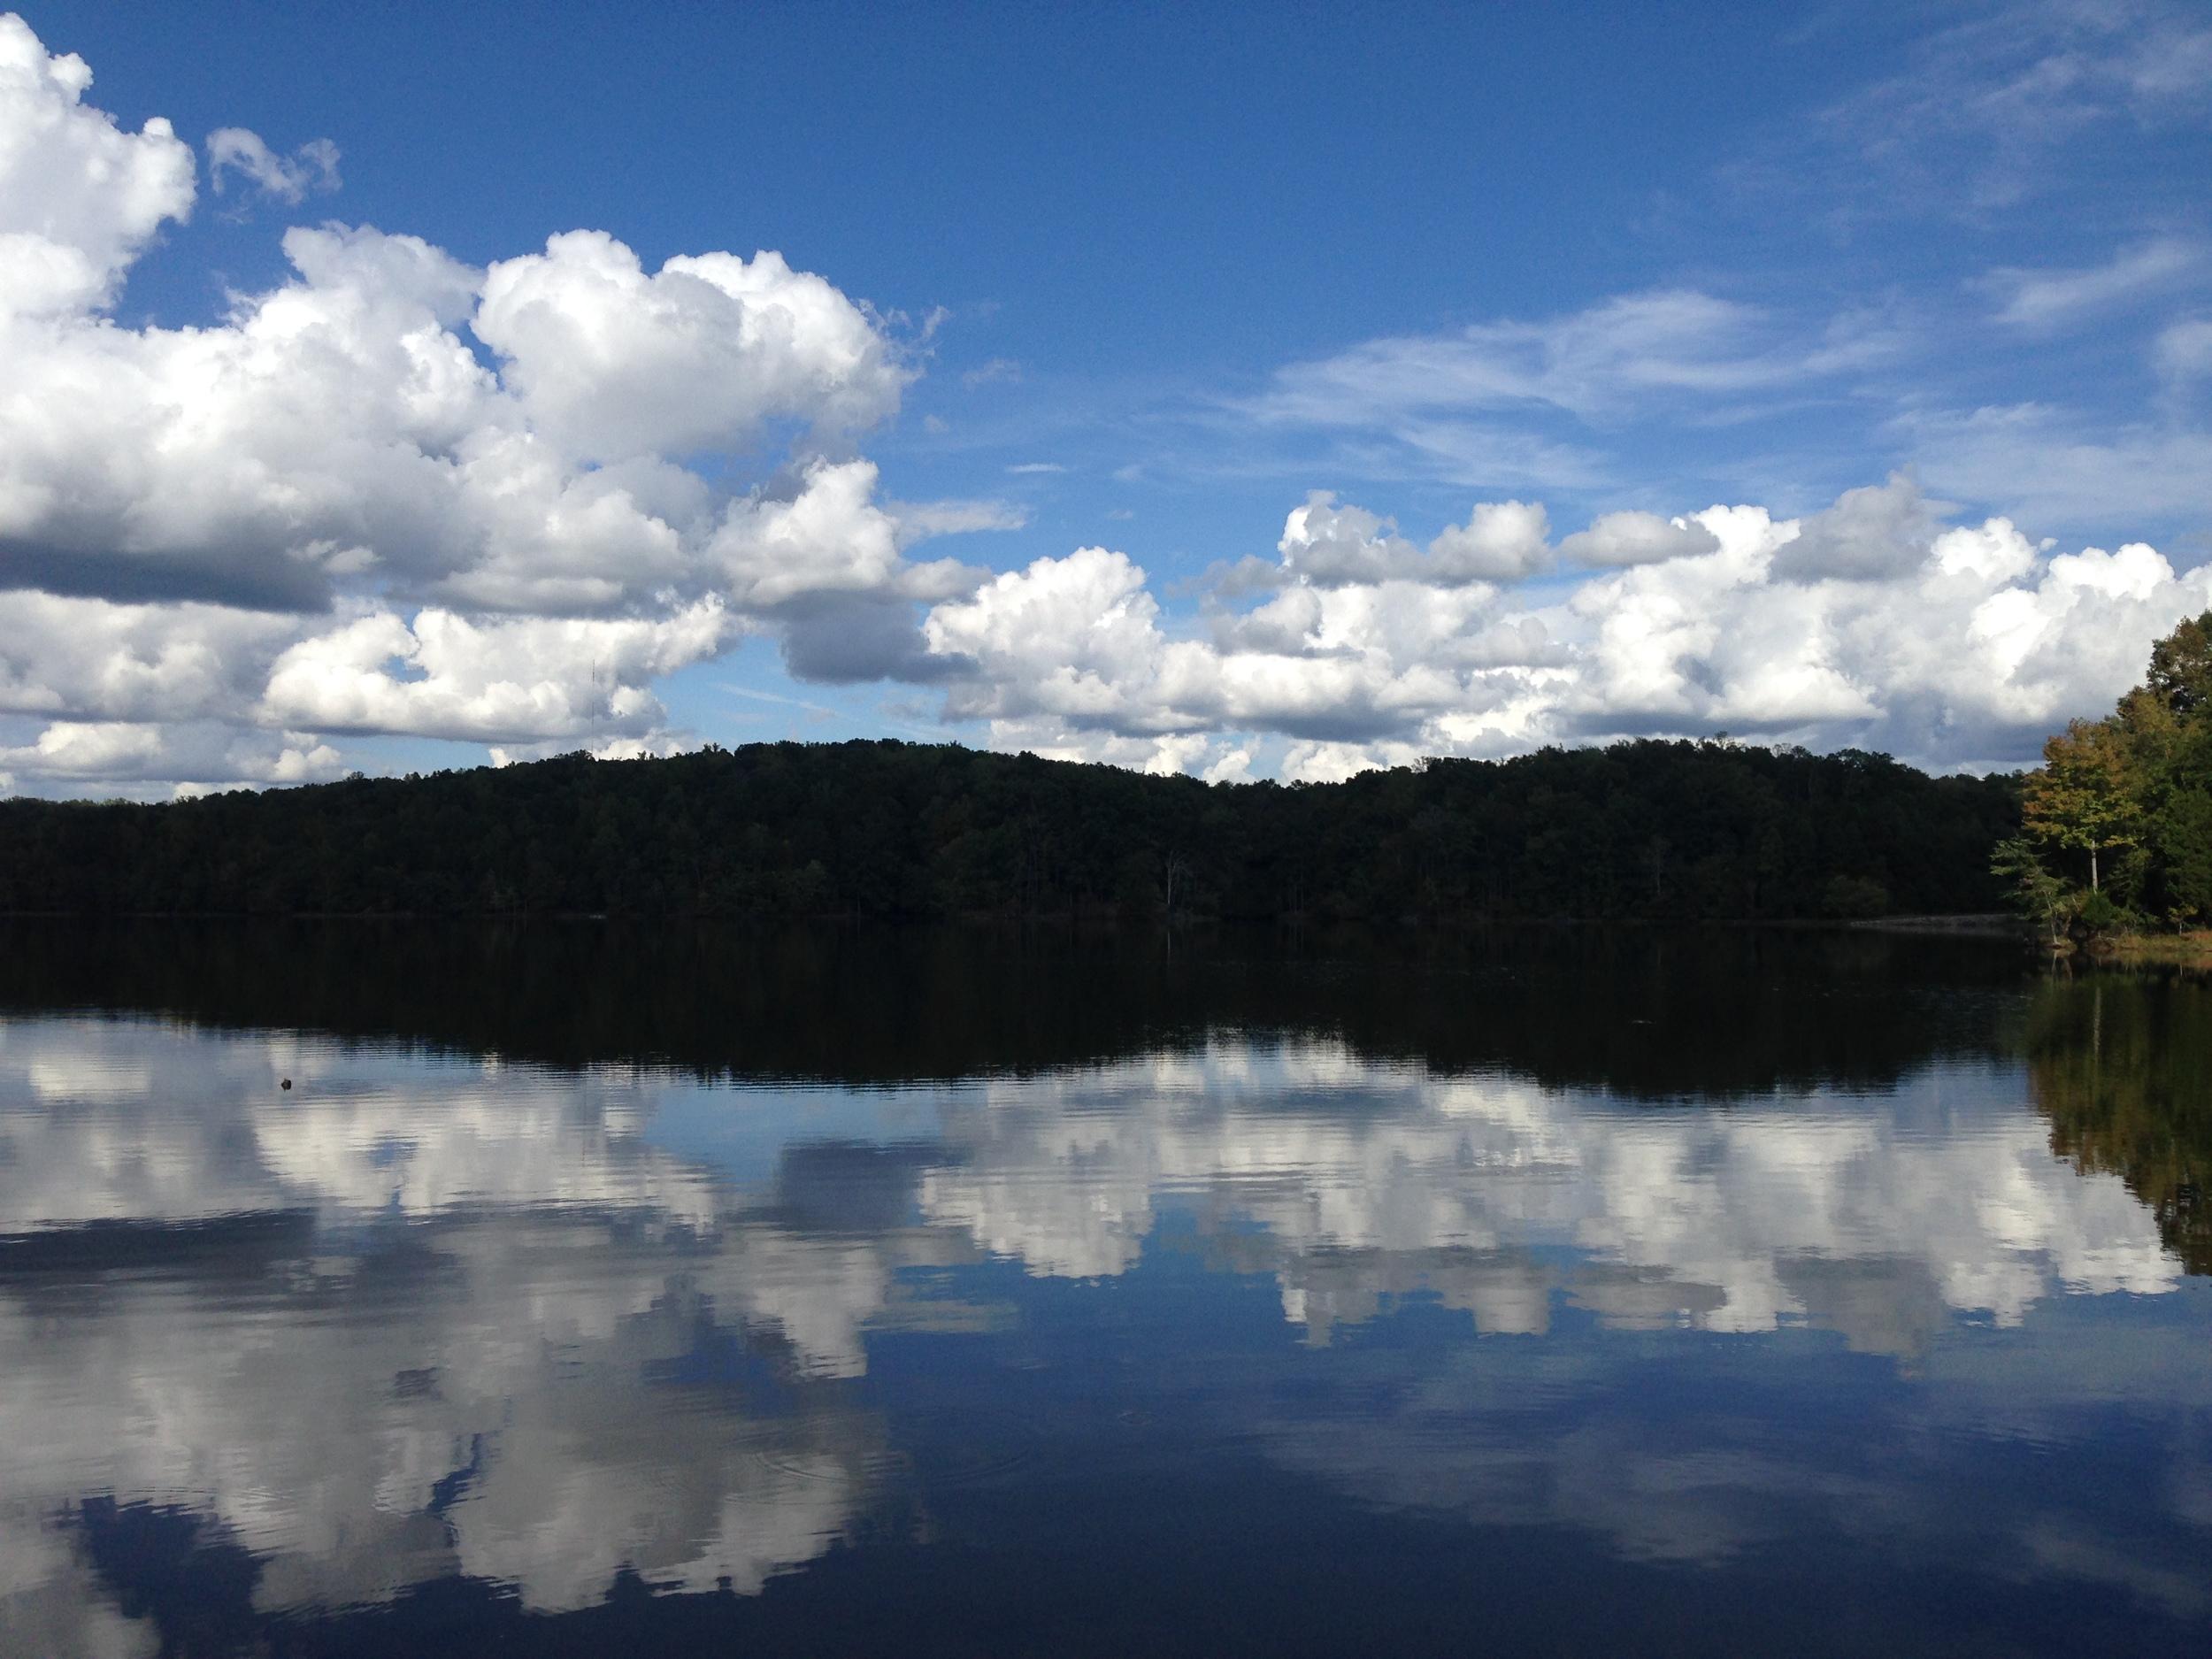 Mirror image on Lake Craig